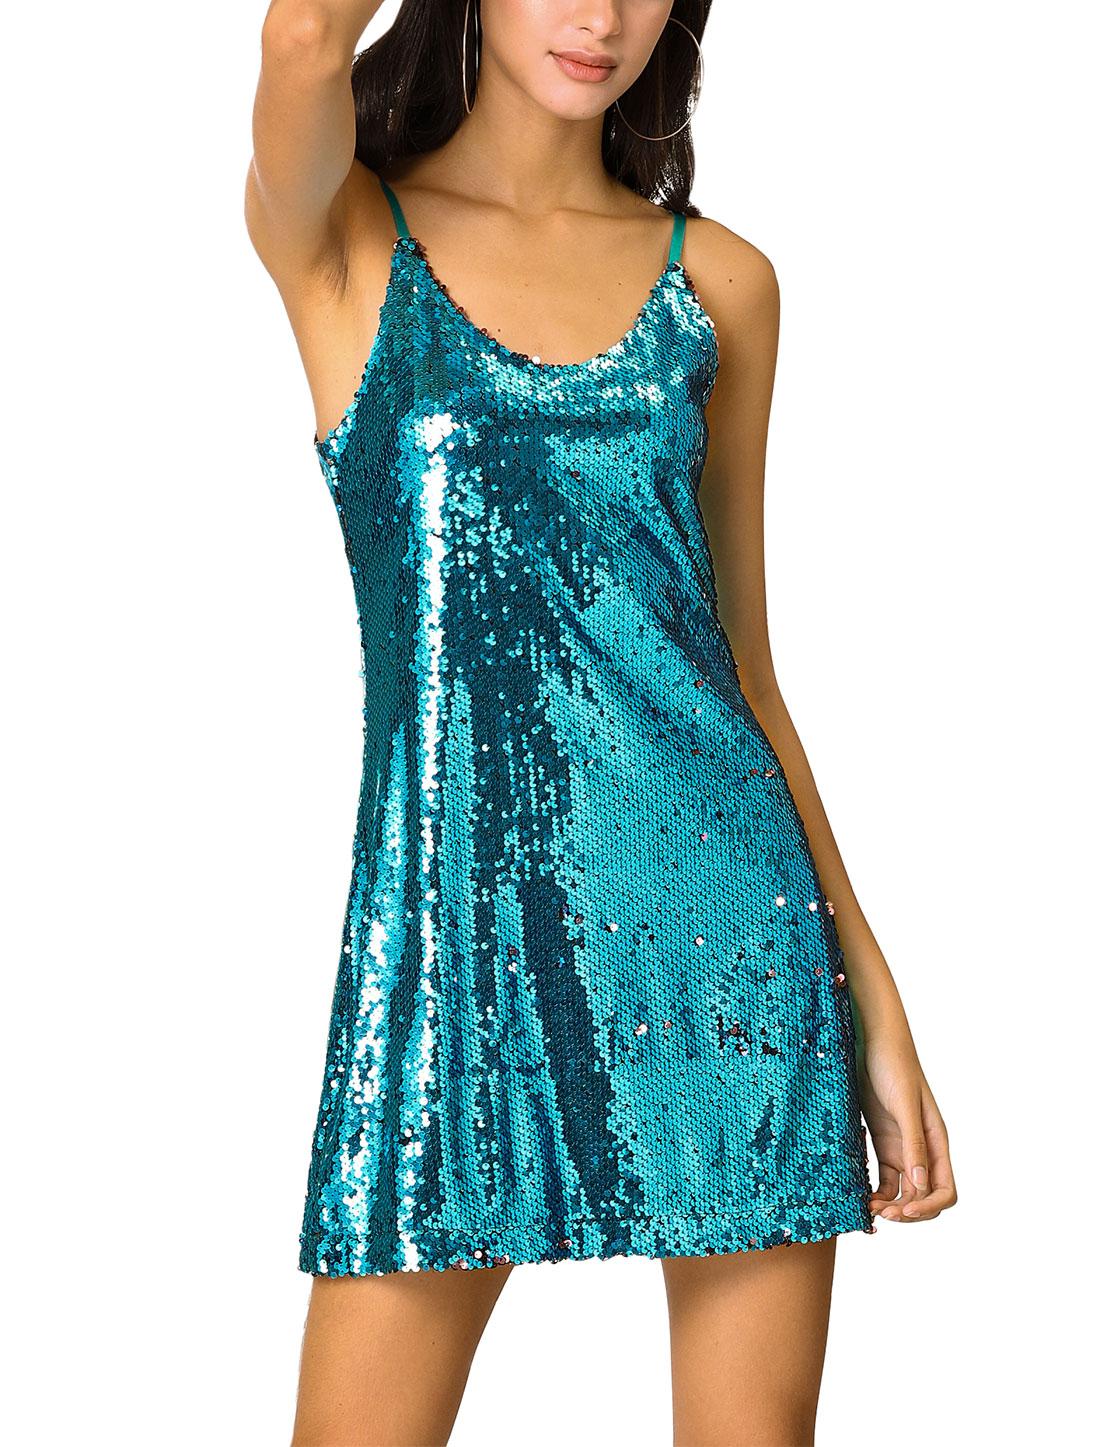 Women's Glitter Sequin V Neck Spaghetti Strap Party Dress Water Blue S